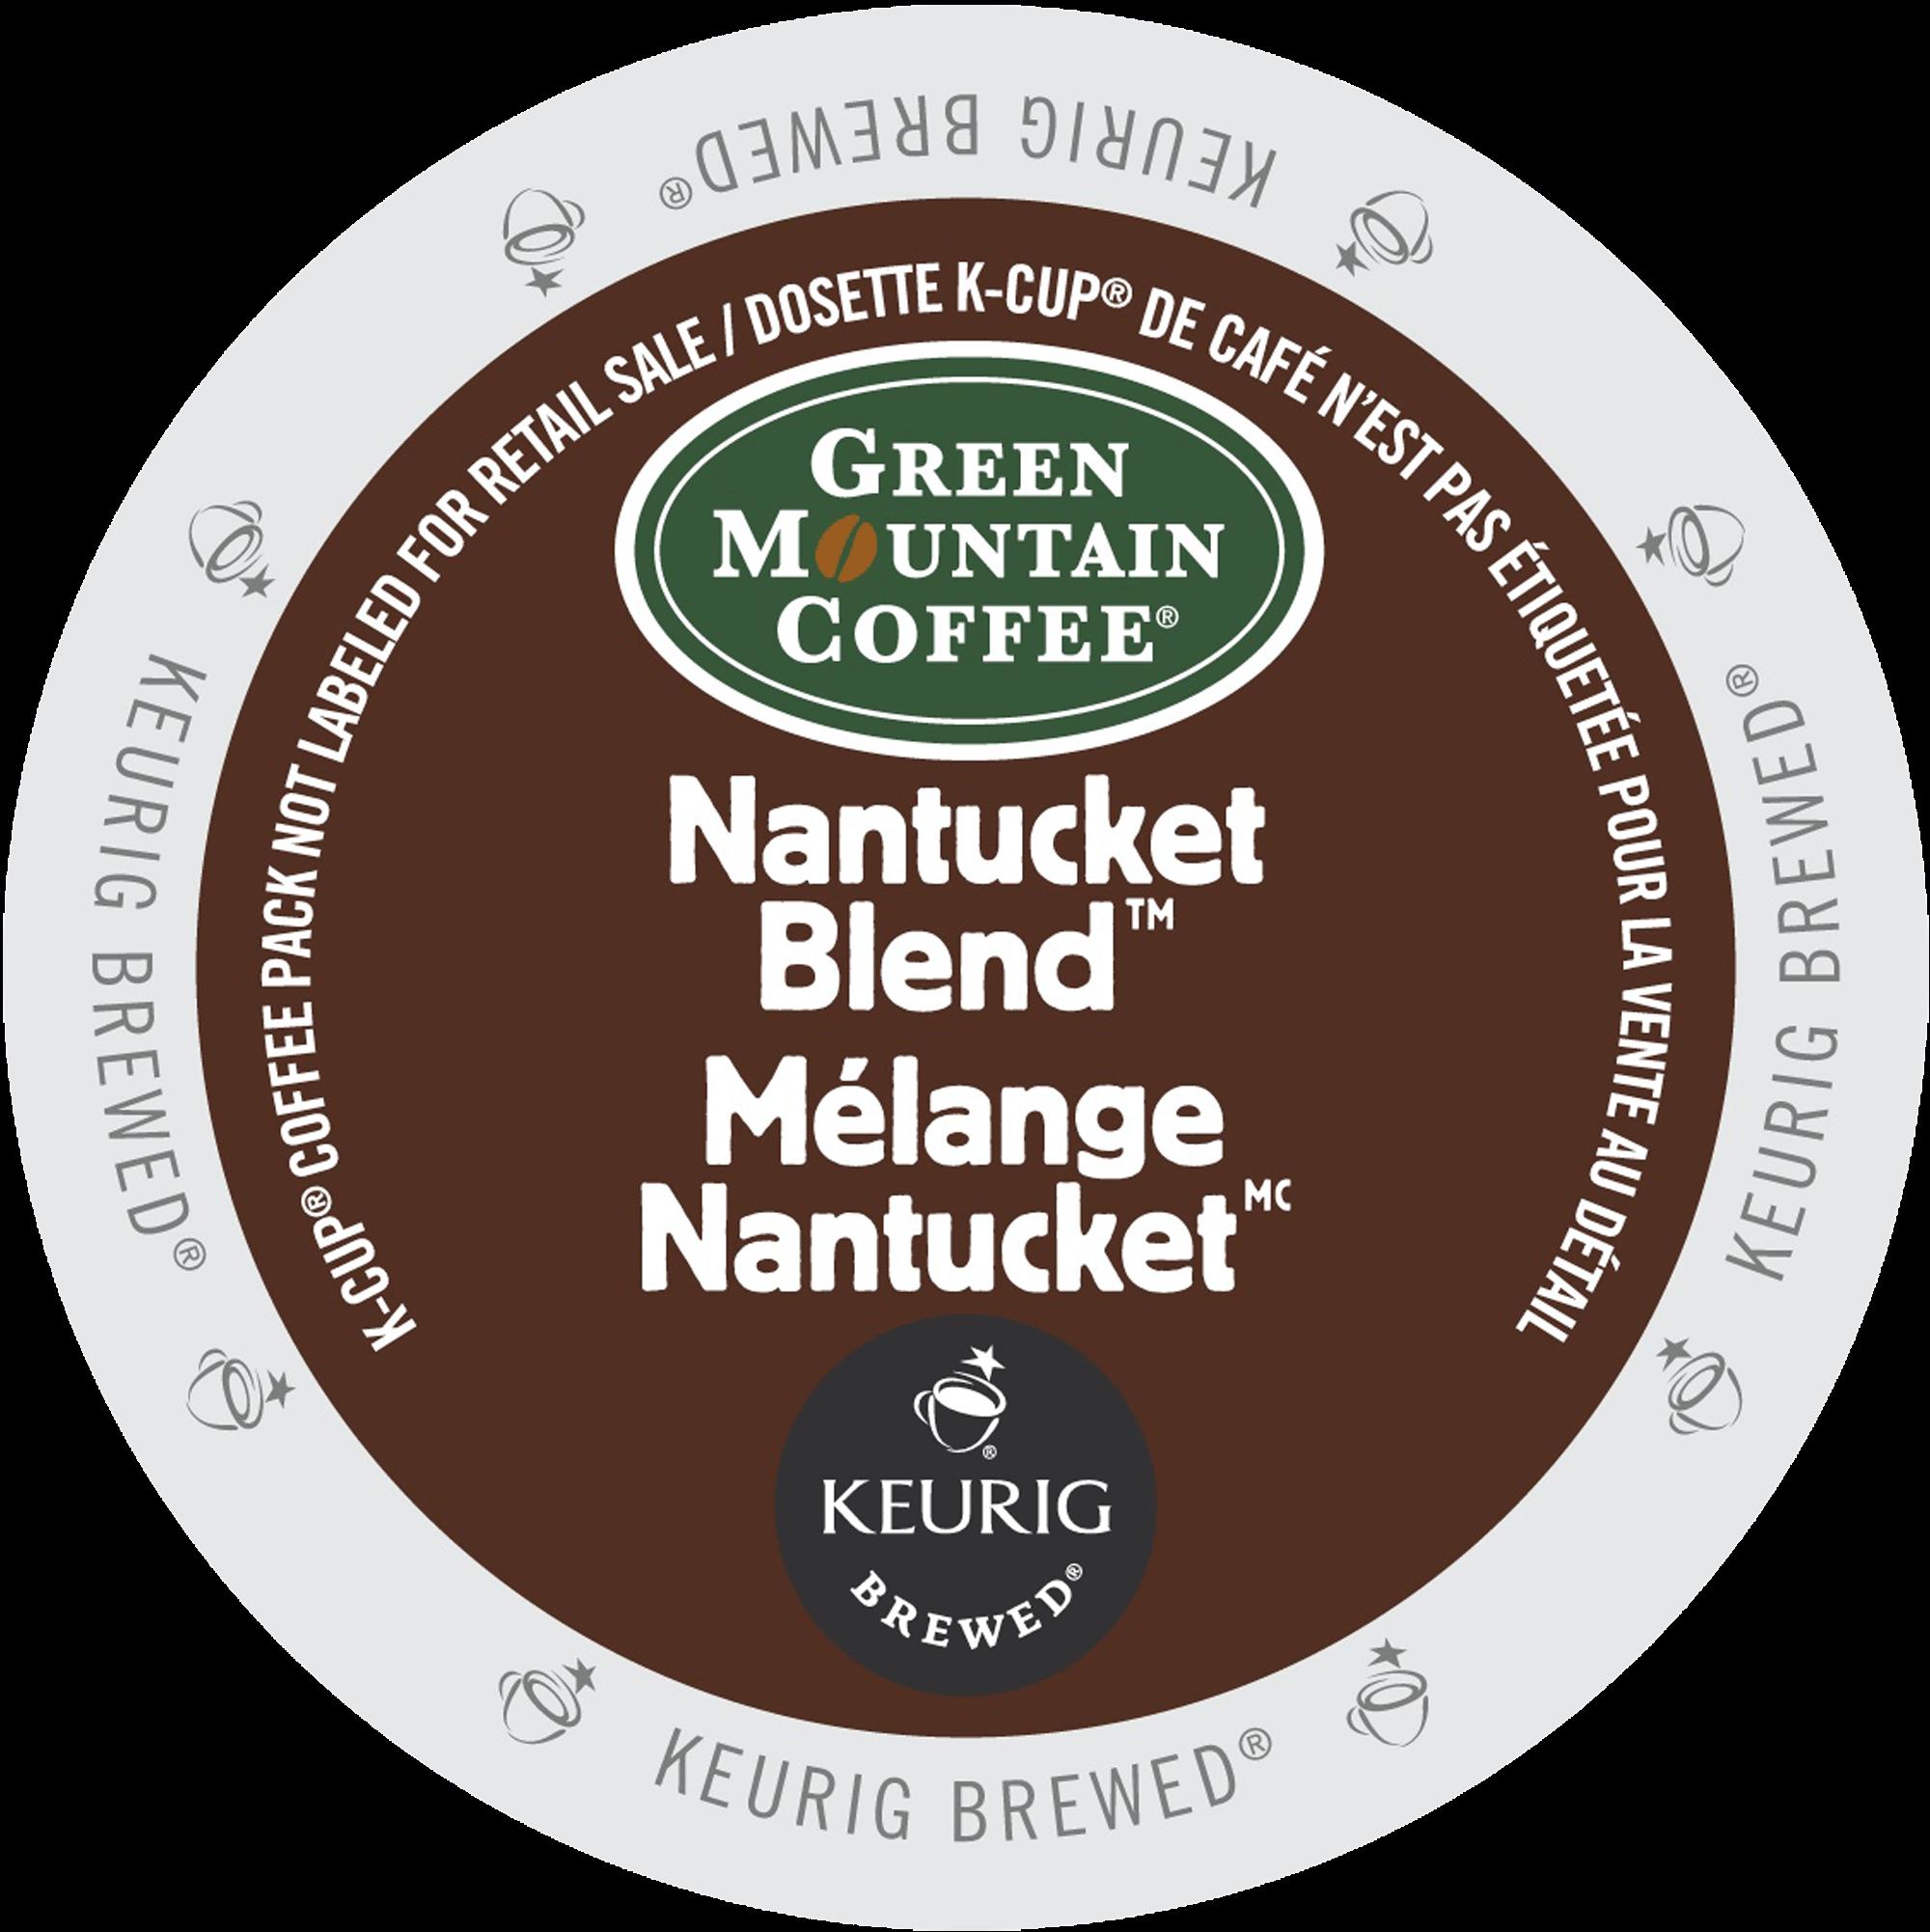 nantucket-blend-coffee-green-mountain-coffee-k-cup_ca_general